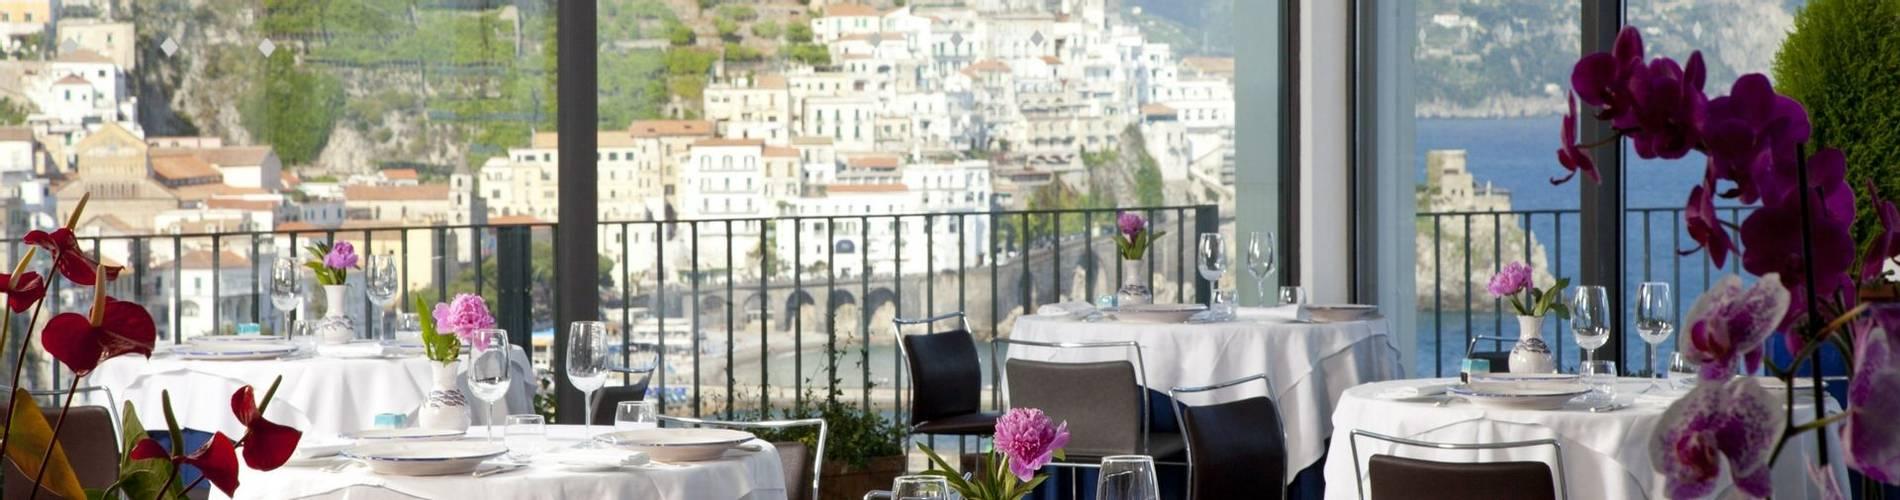 Miramalfi, Amalfi Coast, Italy (24).jpg